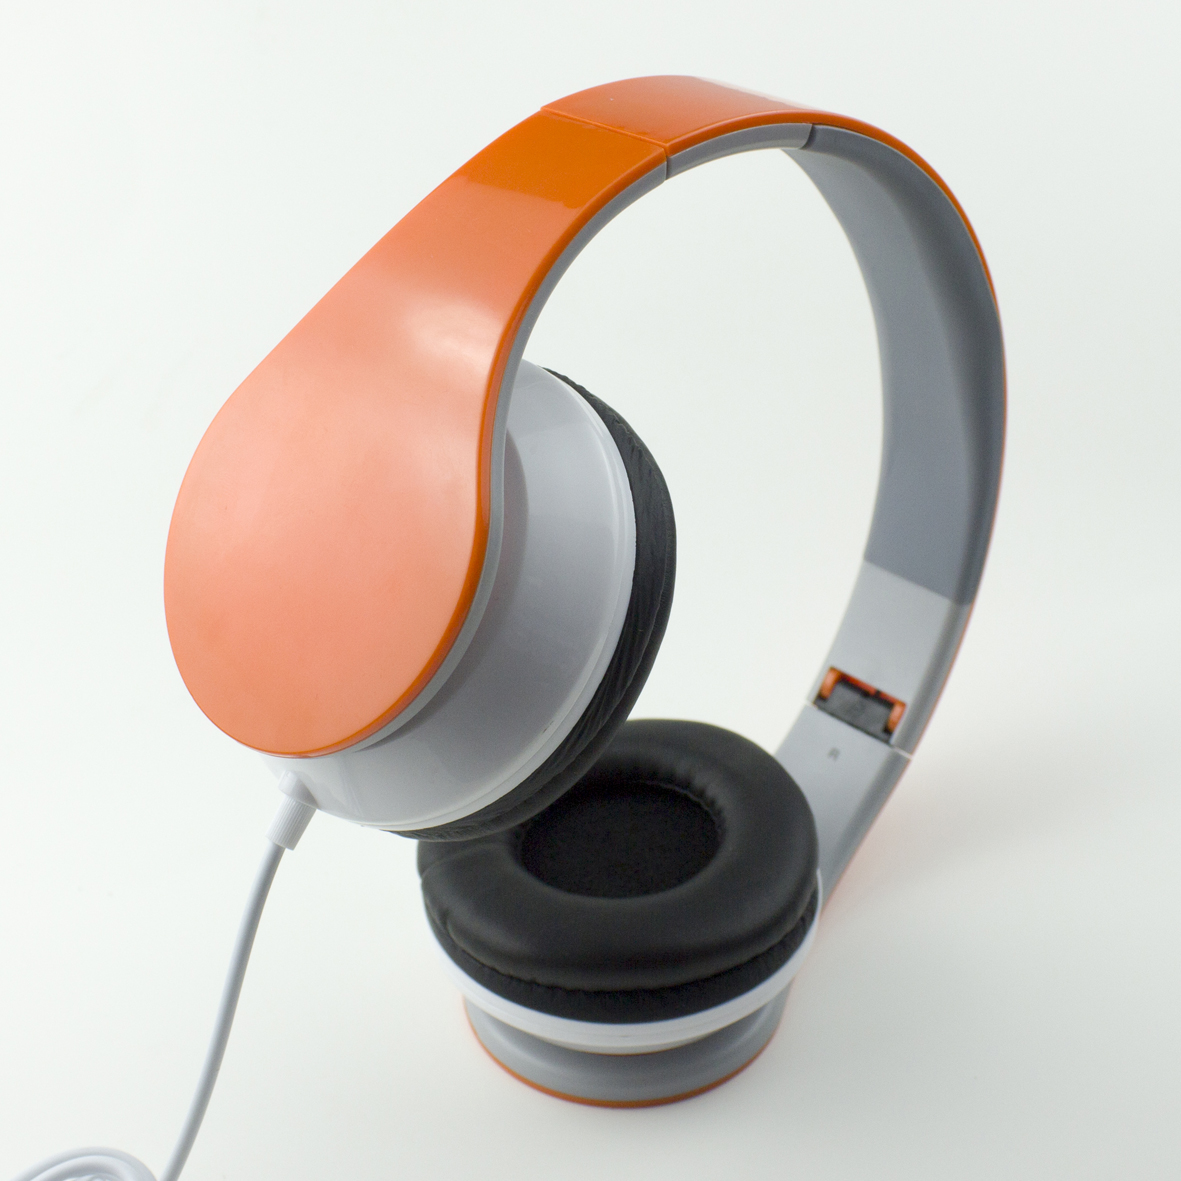 Headphone earbuds cheap - headphone earbuds bluetooth